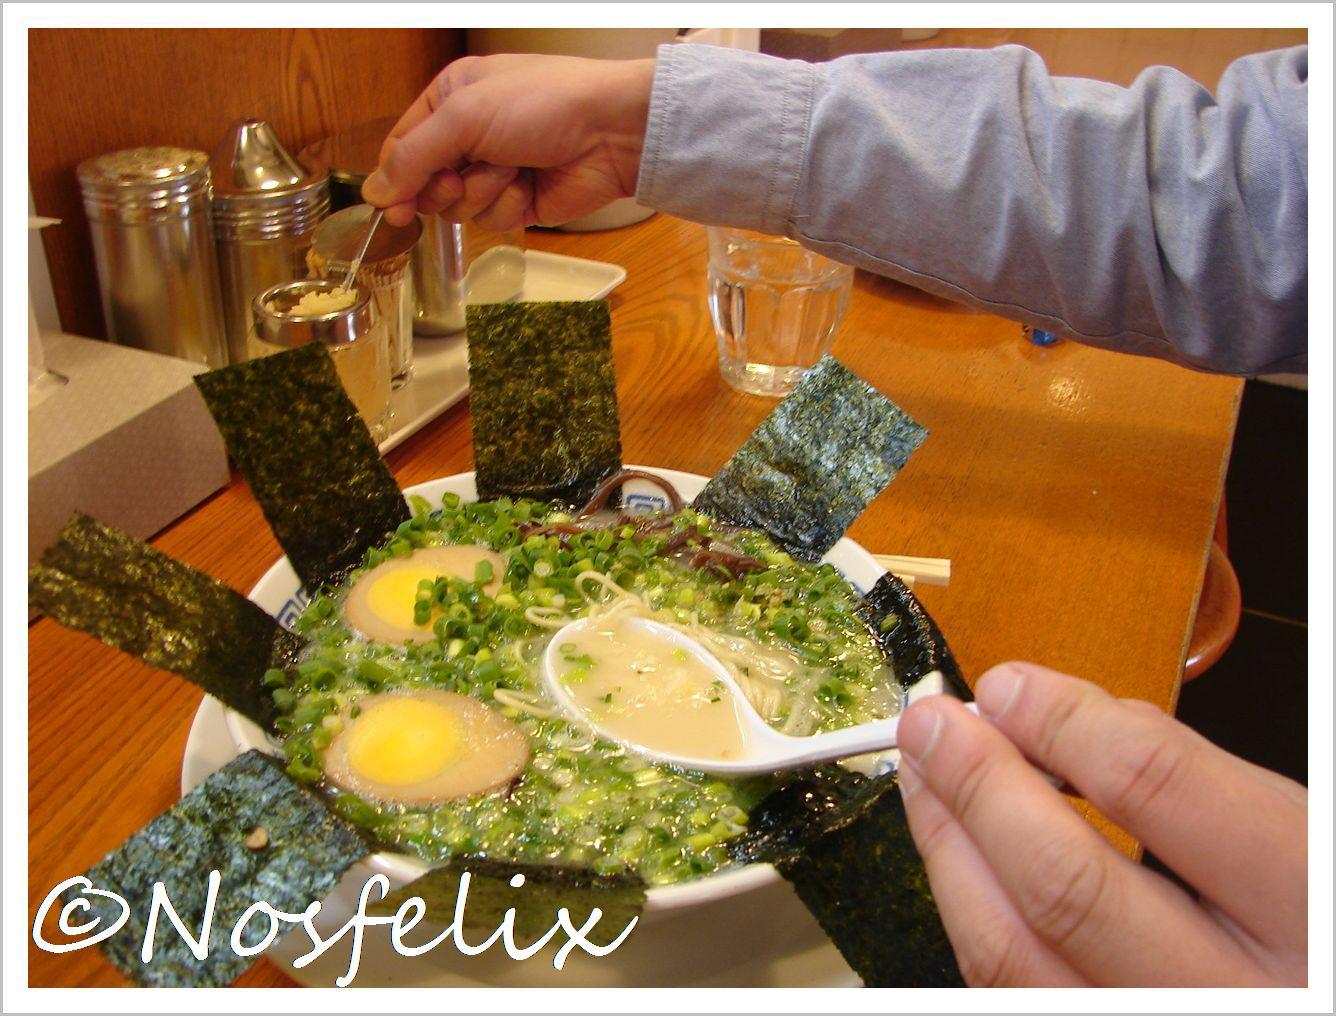 Reputable Japanese Restaurants Tokyo Marukin Hakata Style Howto Eat Add Some Garlic Japanese Restaurants Tokyo Marukin Hakata Style How To Eat Ramen Korean Style How To Eat Ramen Without A Fork nice food How To Eat Ramen